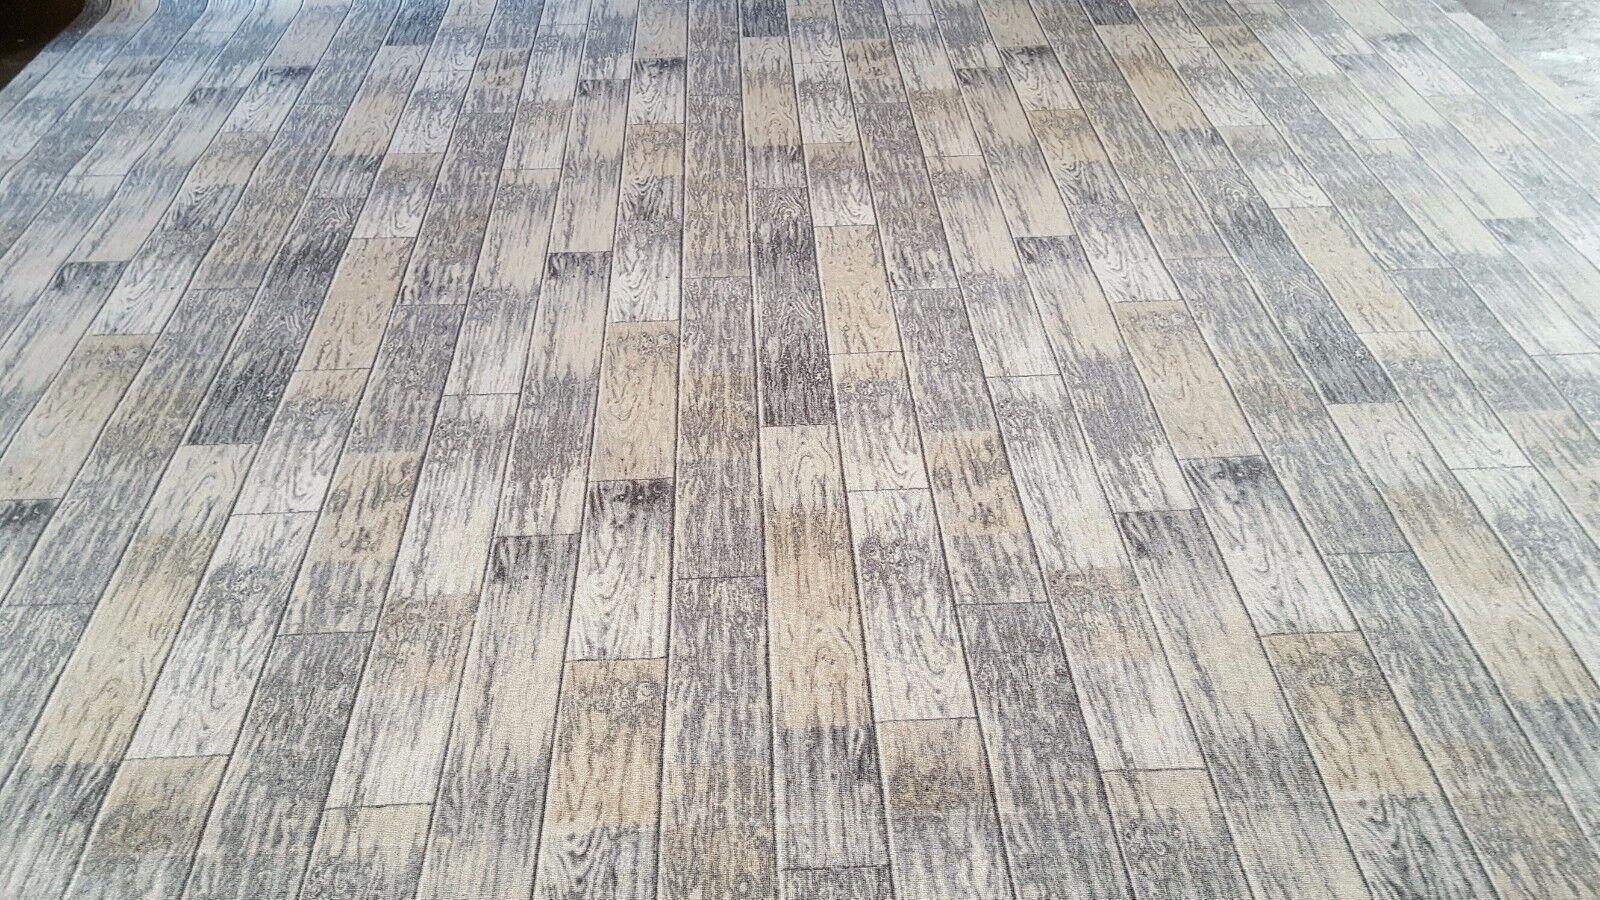 Teppichboden 9,99€/m² Design Holz Planken Silber grau Auslegware 200 cm